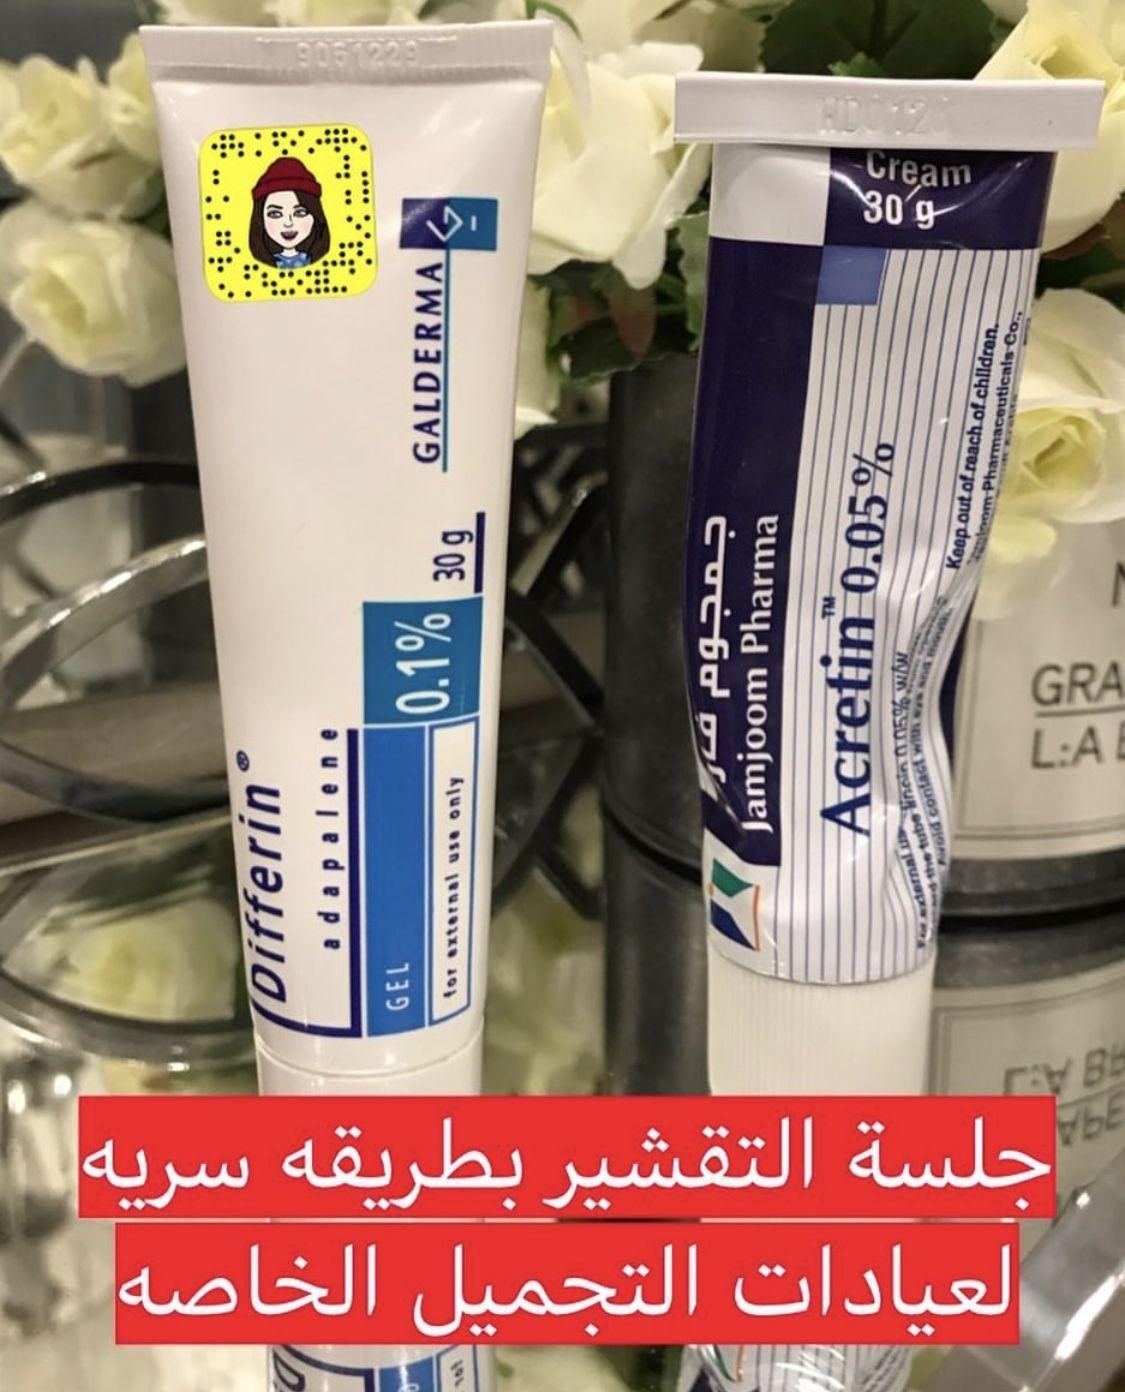 كريم أكرتين Acretin لعلاج حب الشباب Cream Tretinoin Acne Treatment